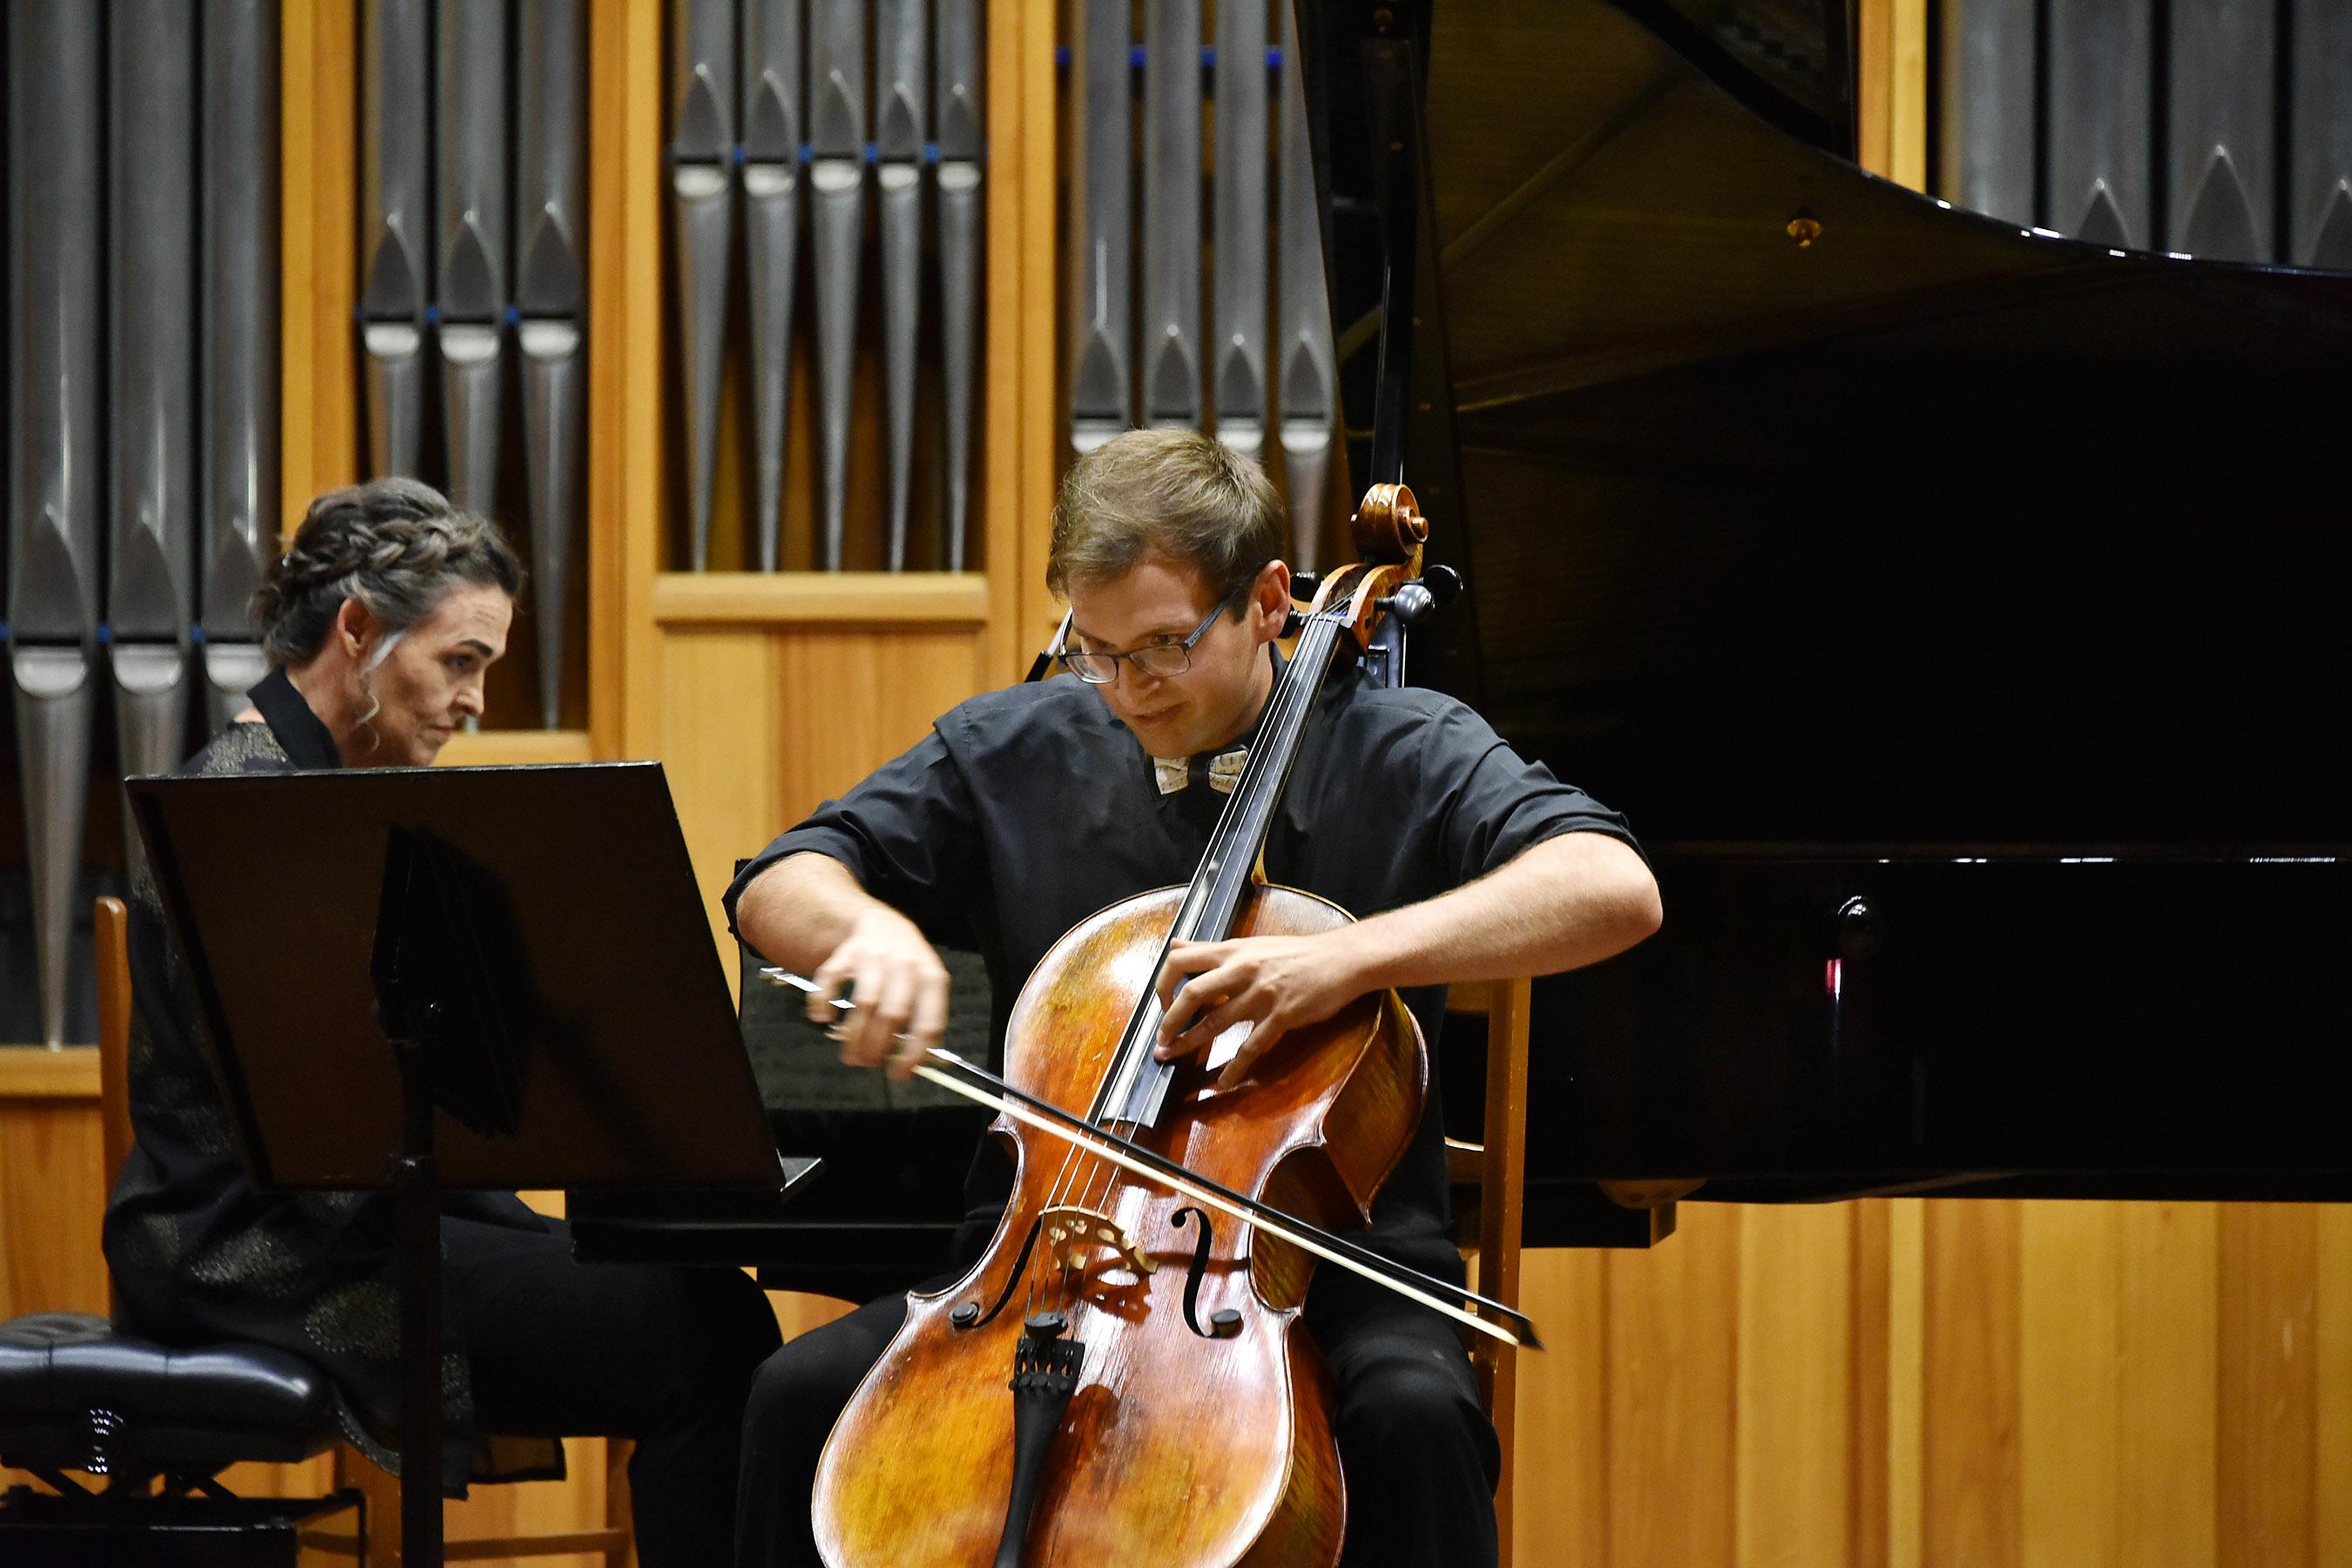 Chris van Zyl ( cello) and Anneka Lamont (Piano)